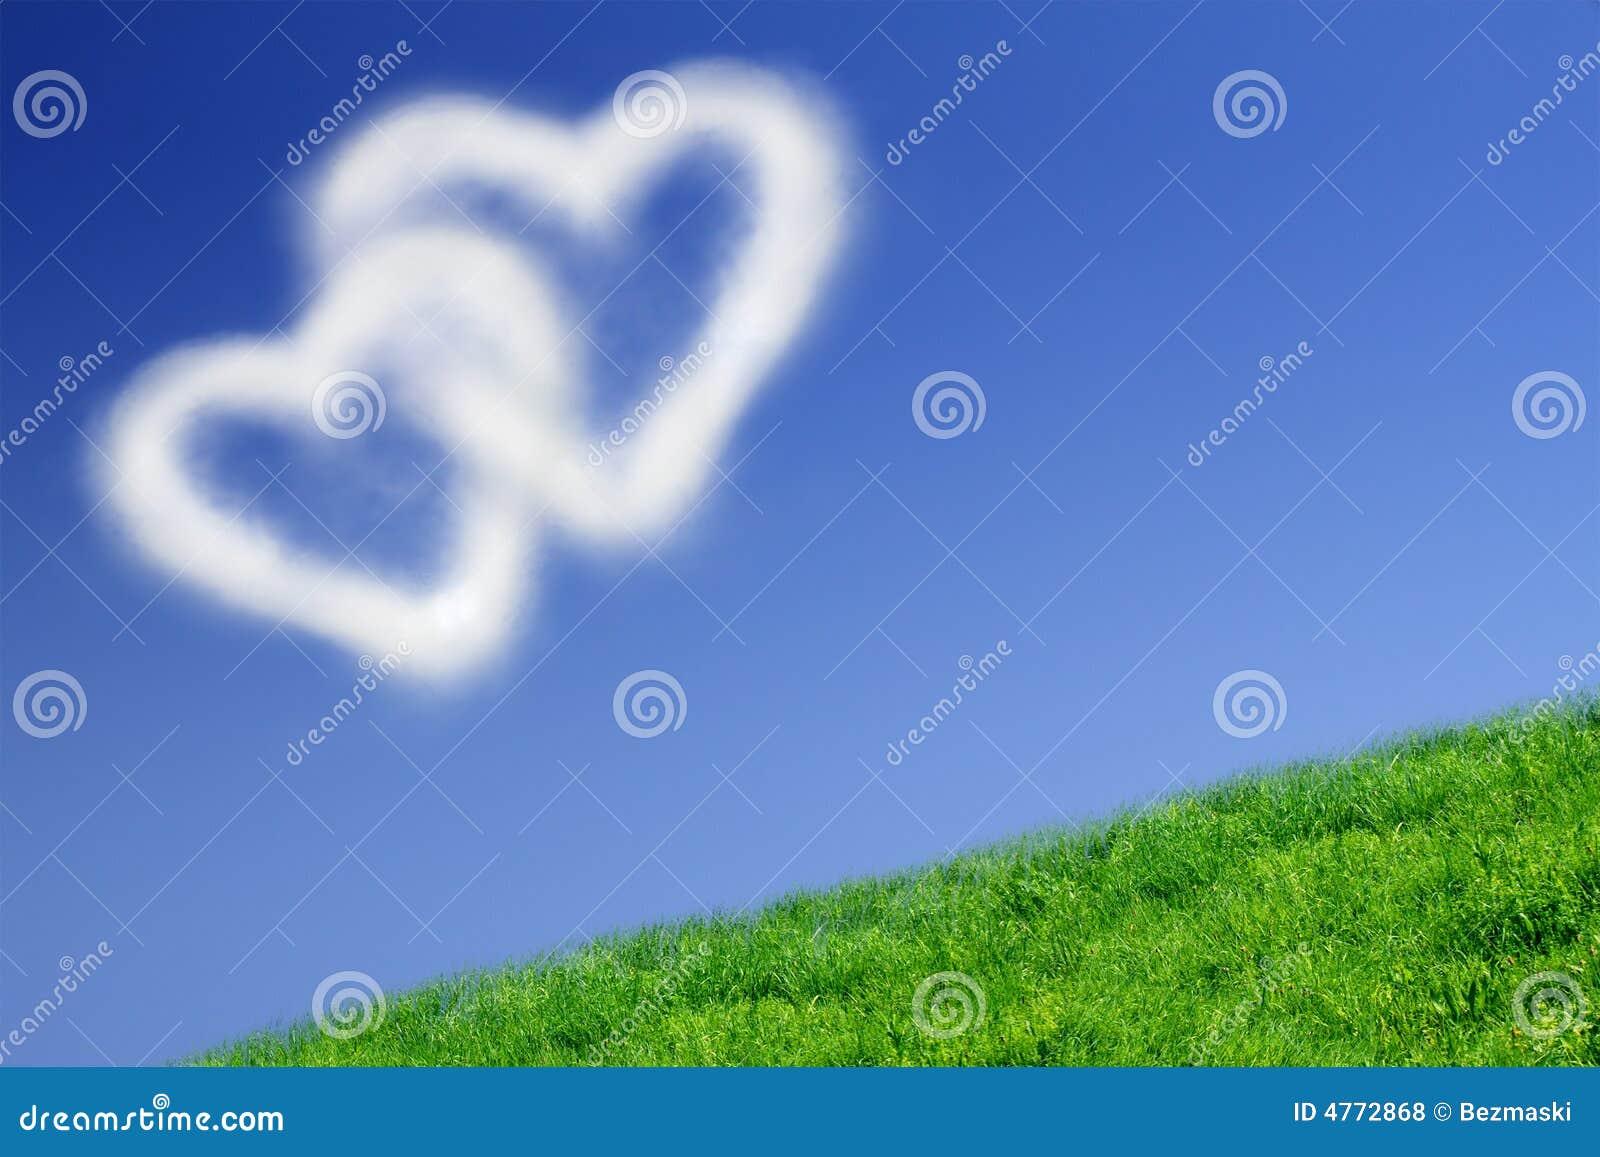 Duas nuvens heart-shaped